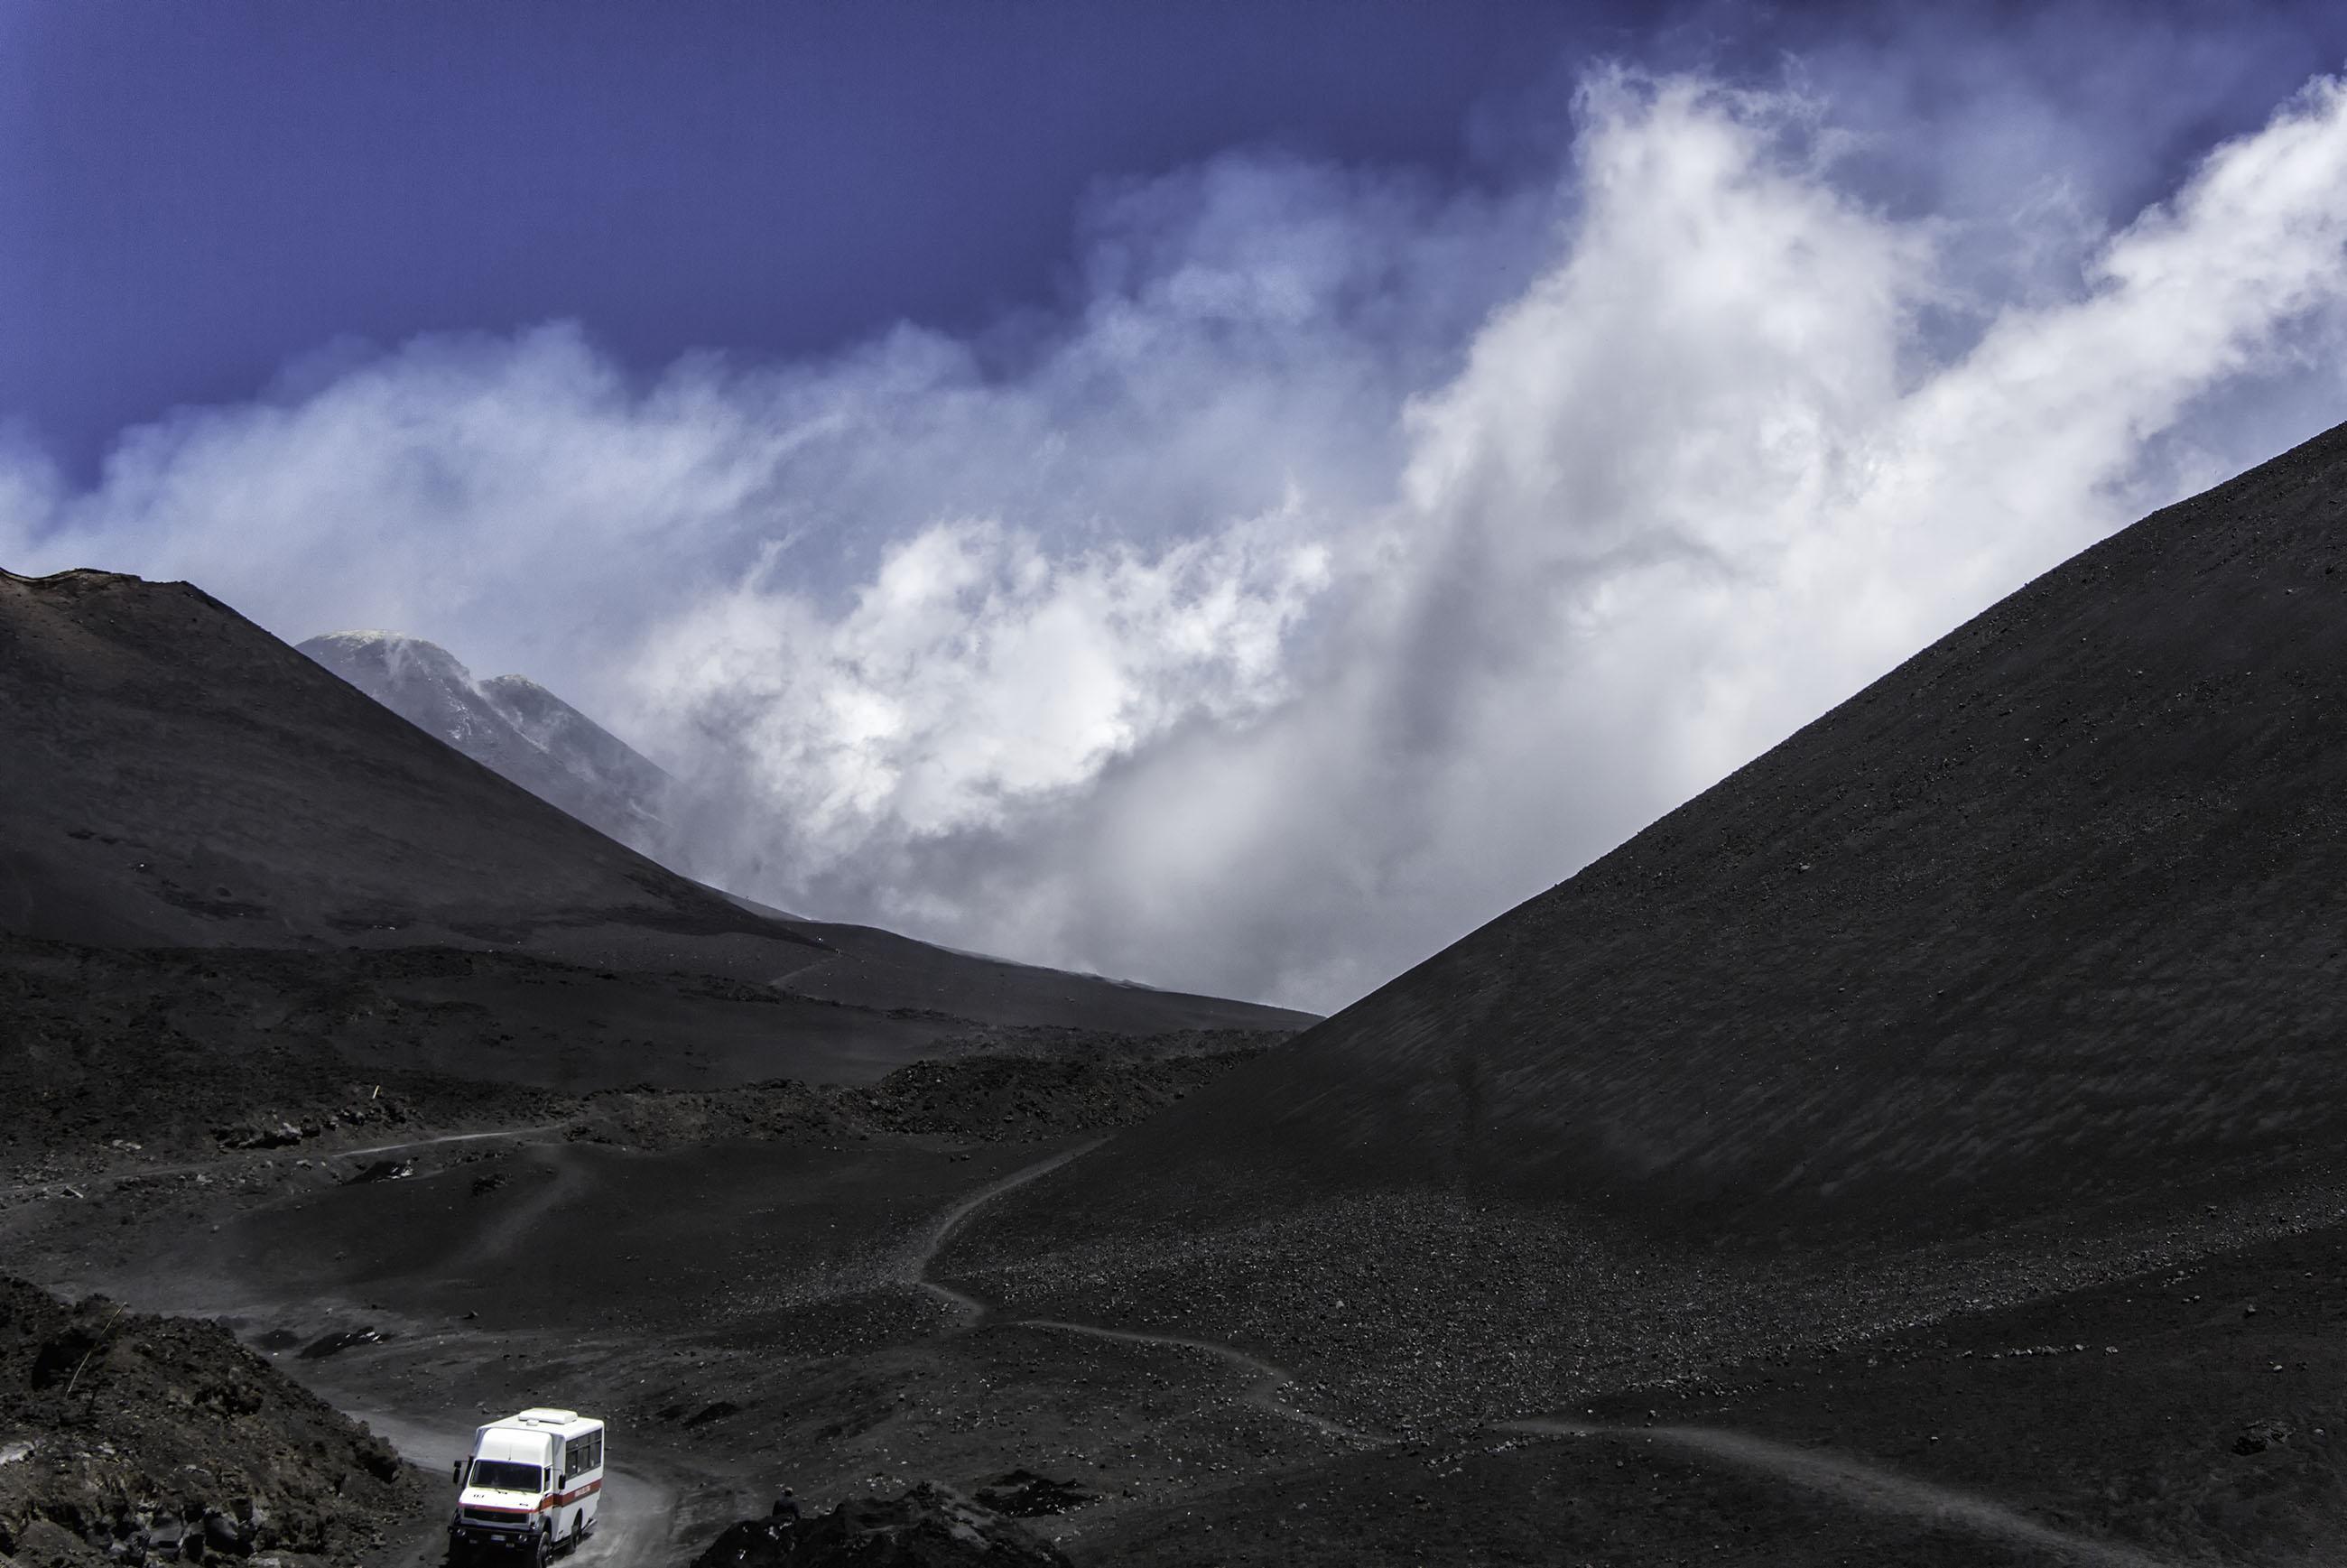 Volcano, Science, Nature, Risk, Rock, HQ Photo